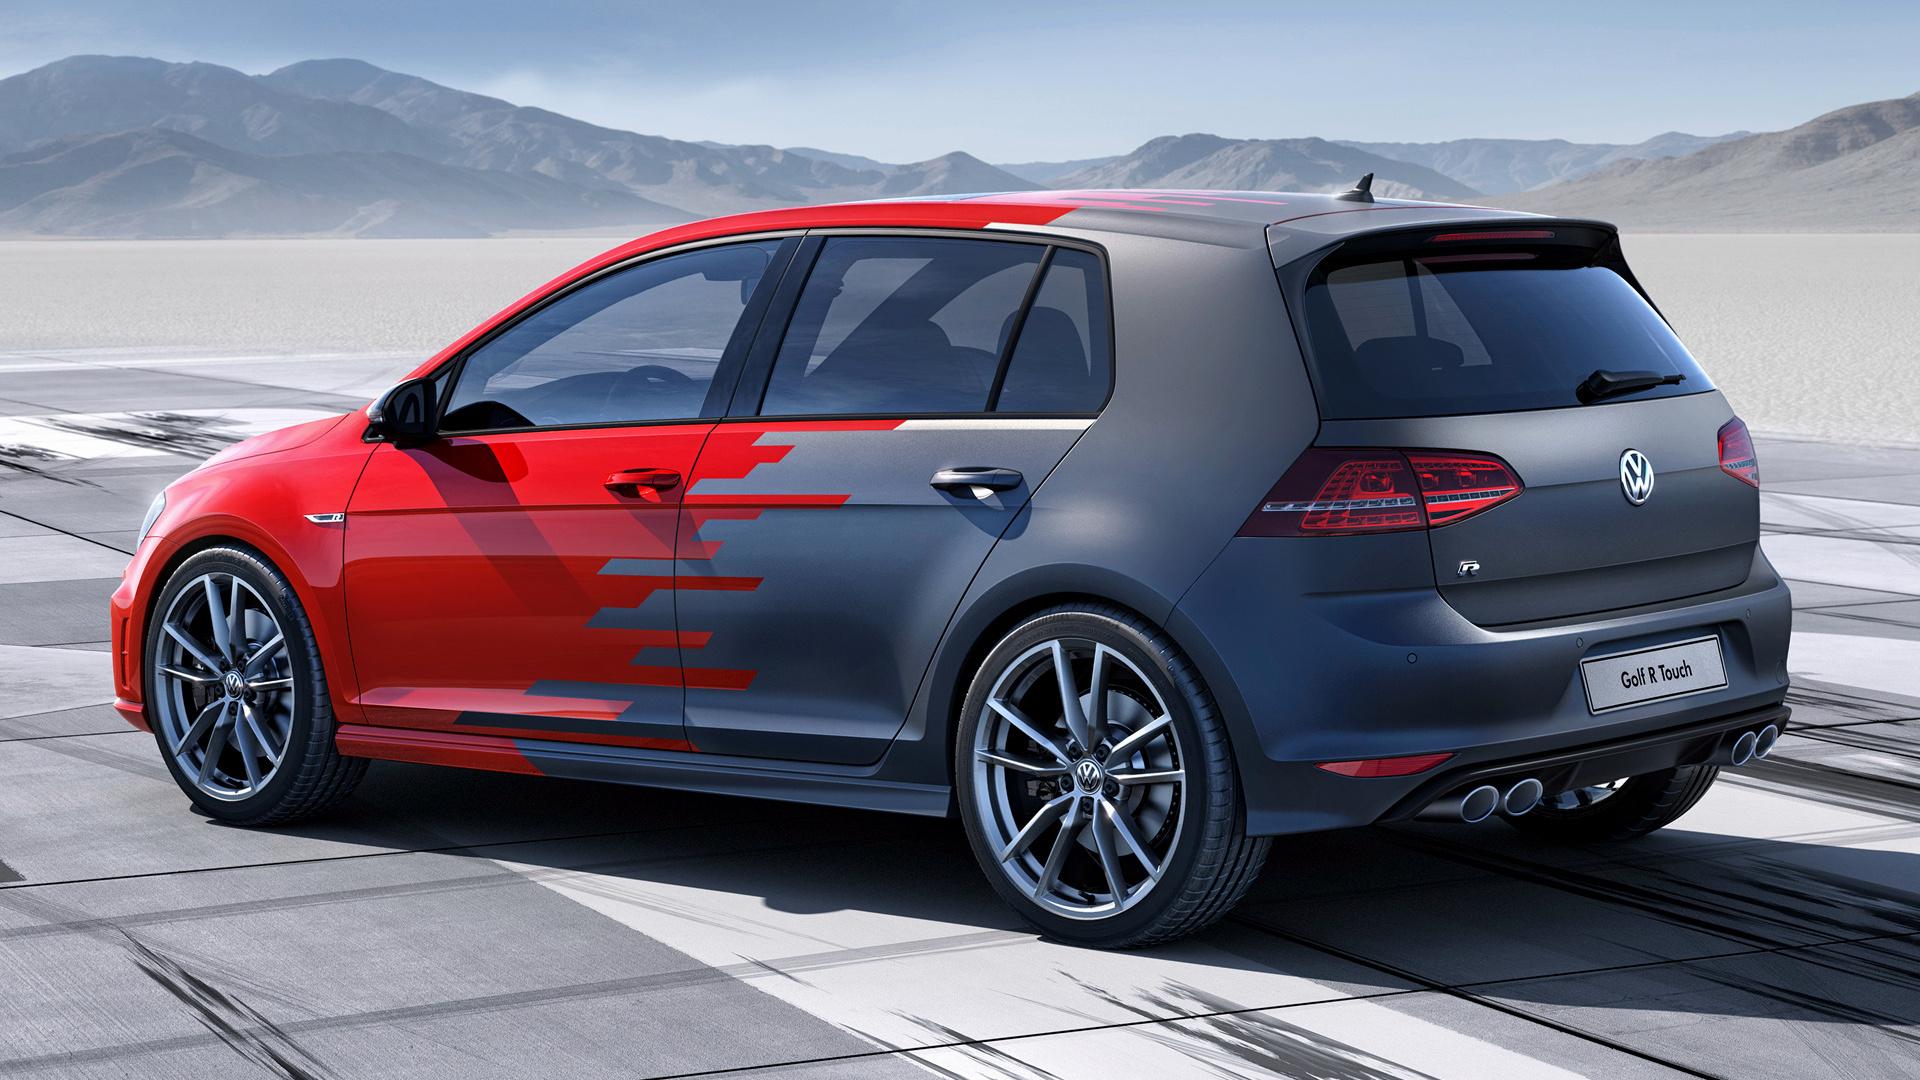 Mk7 Golf R >> Volkswagen Golf R Touch 5-door (2015) Wallpapers and HD Images - Car Pixel